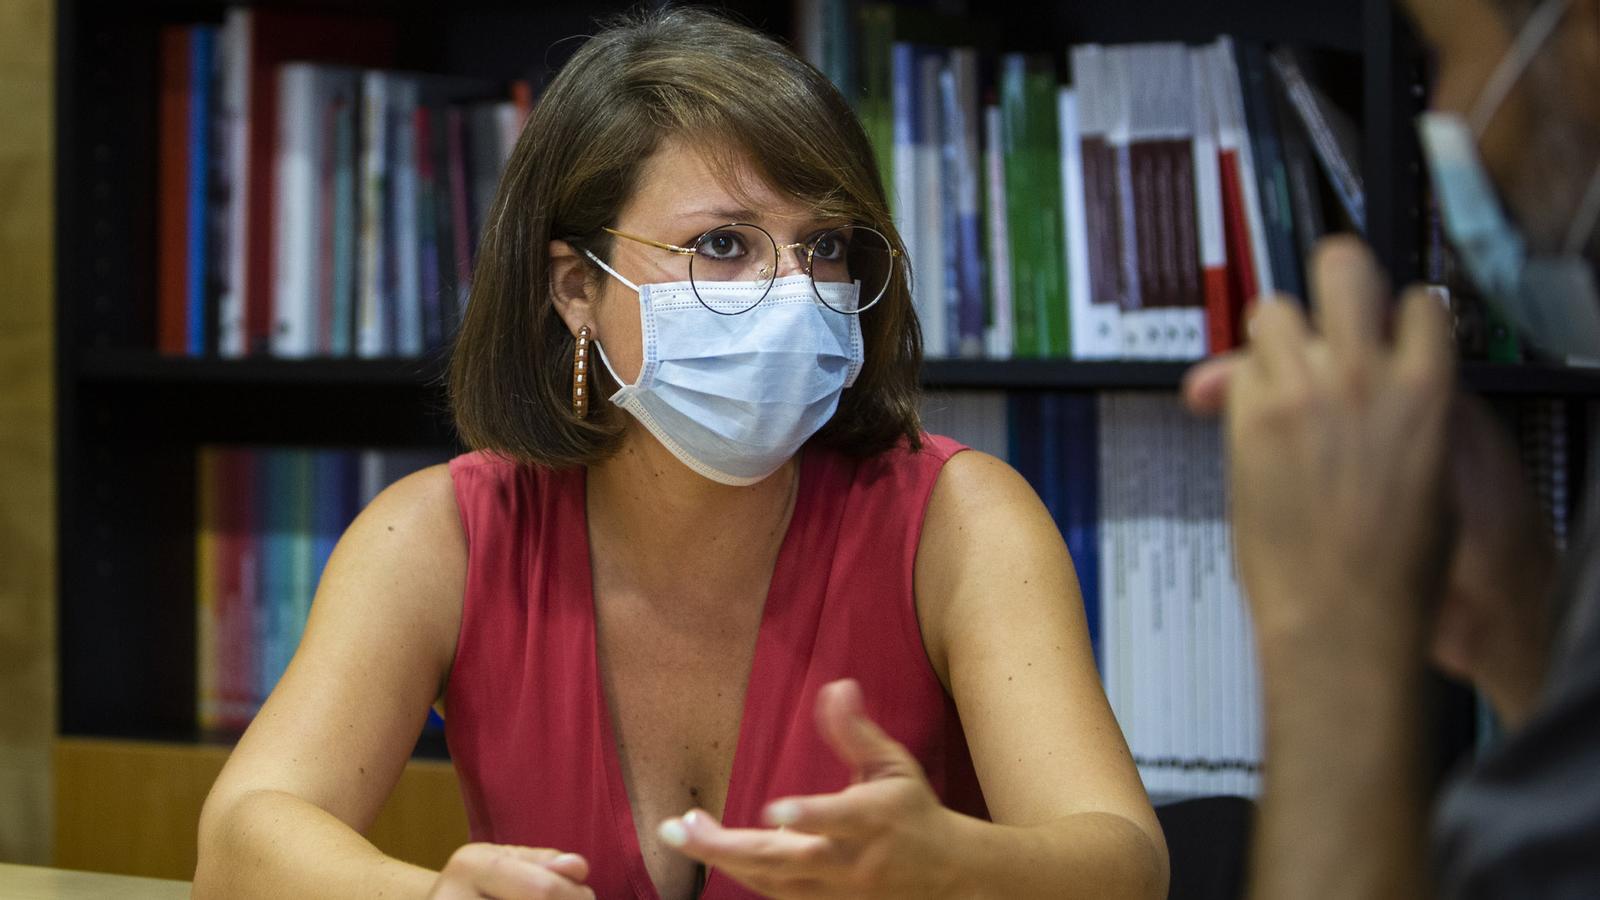 Entrevista de Jordi Mumbrú a Janet Sanz